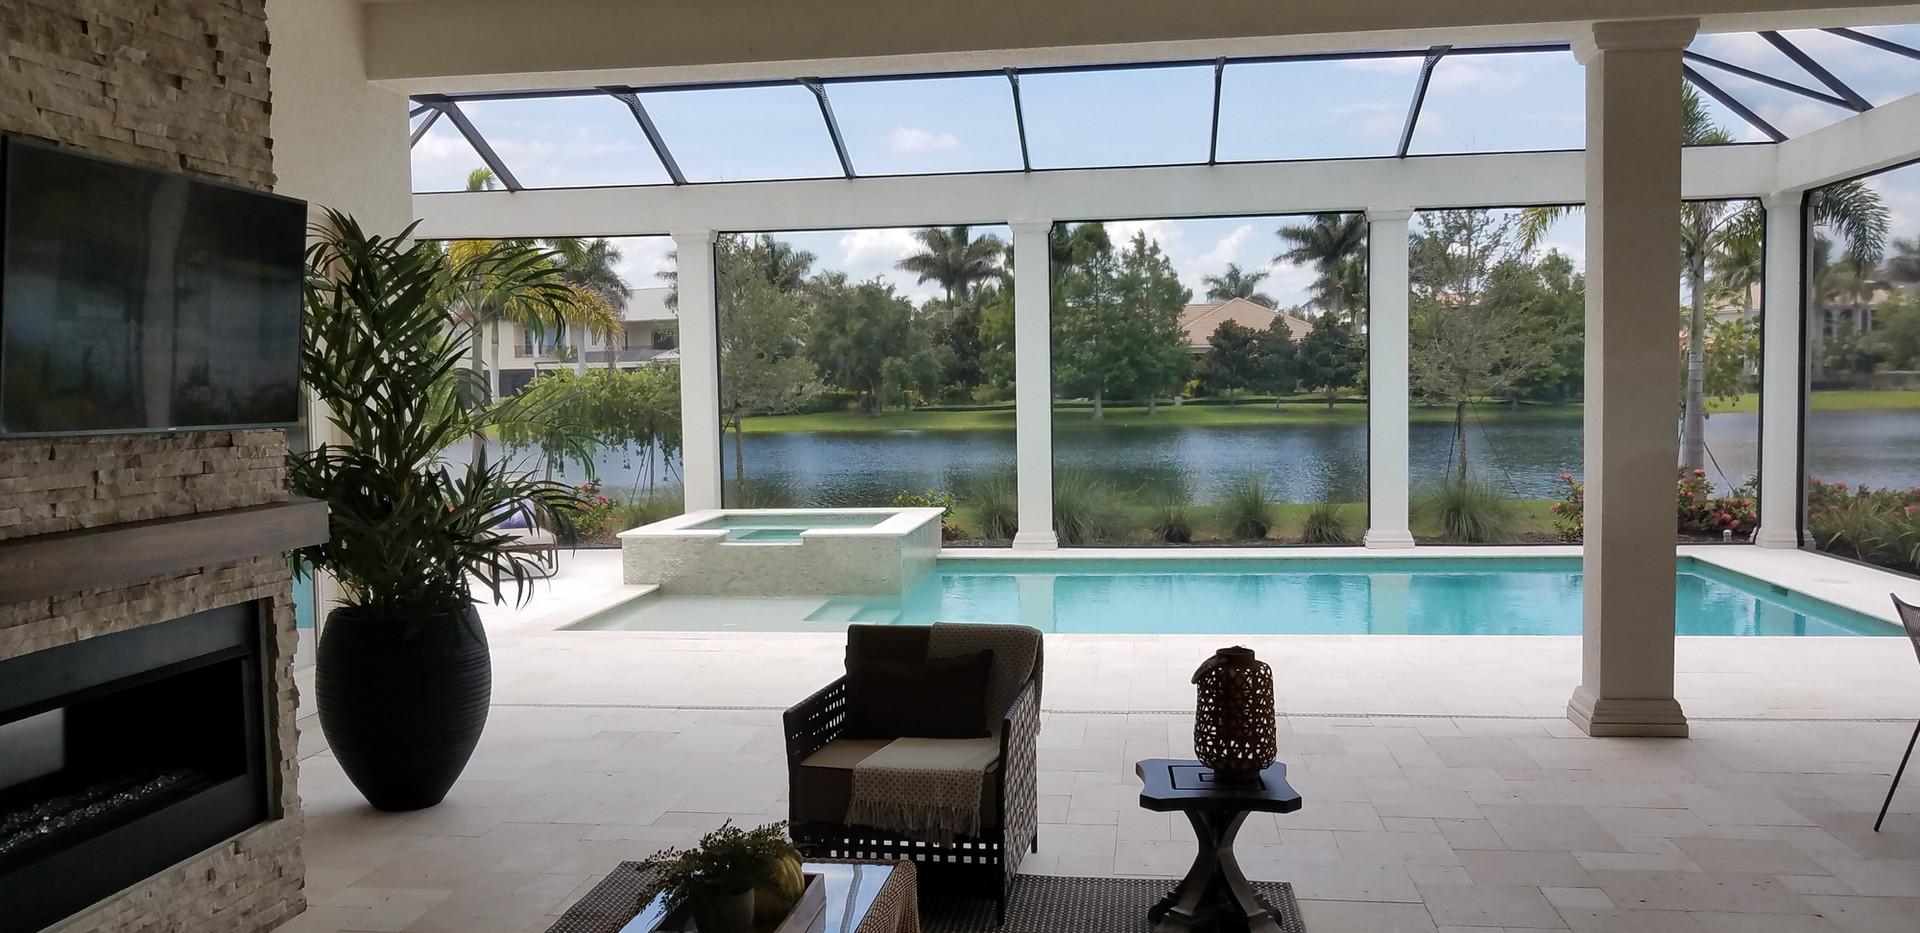 The Lake Club model home pool